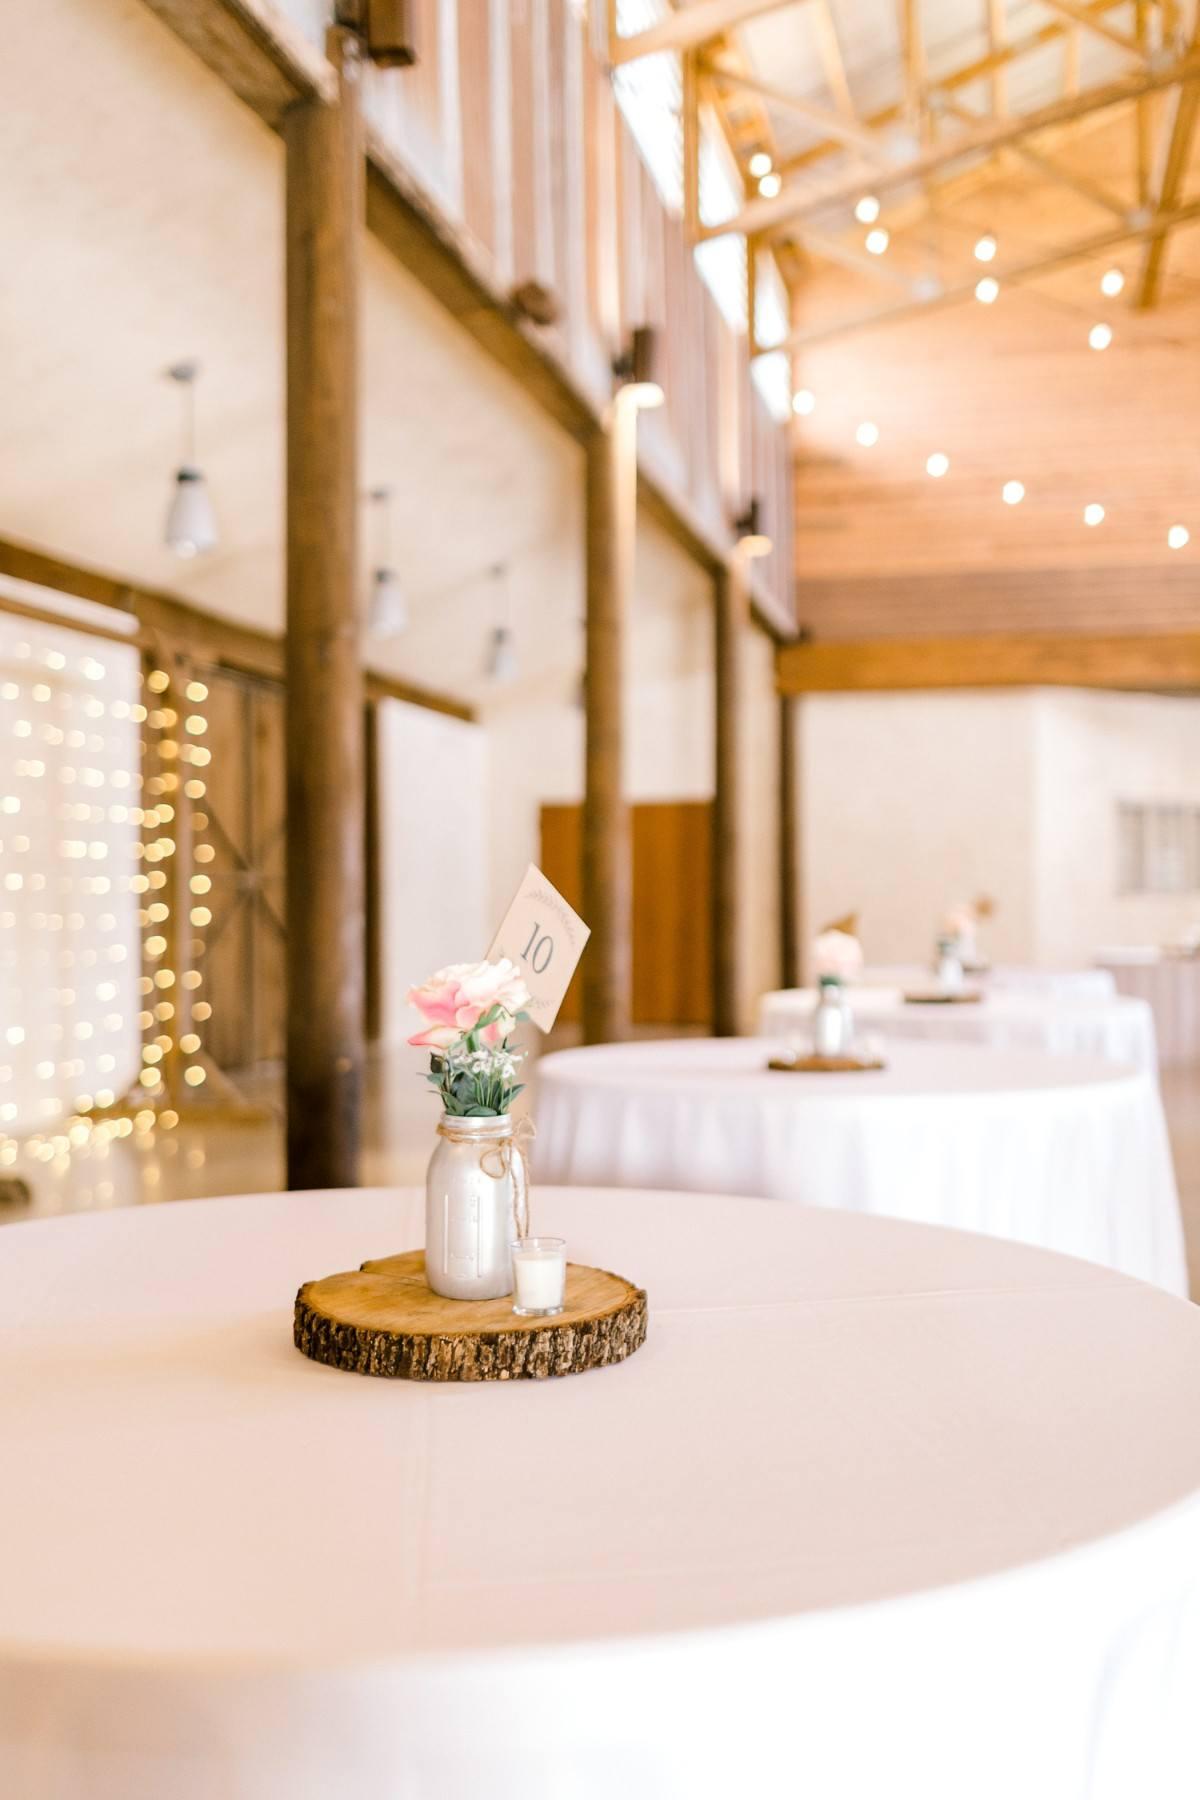 ennis-texas-wedding-photographer-kaitlyn-bullard-52.jpg